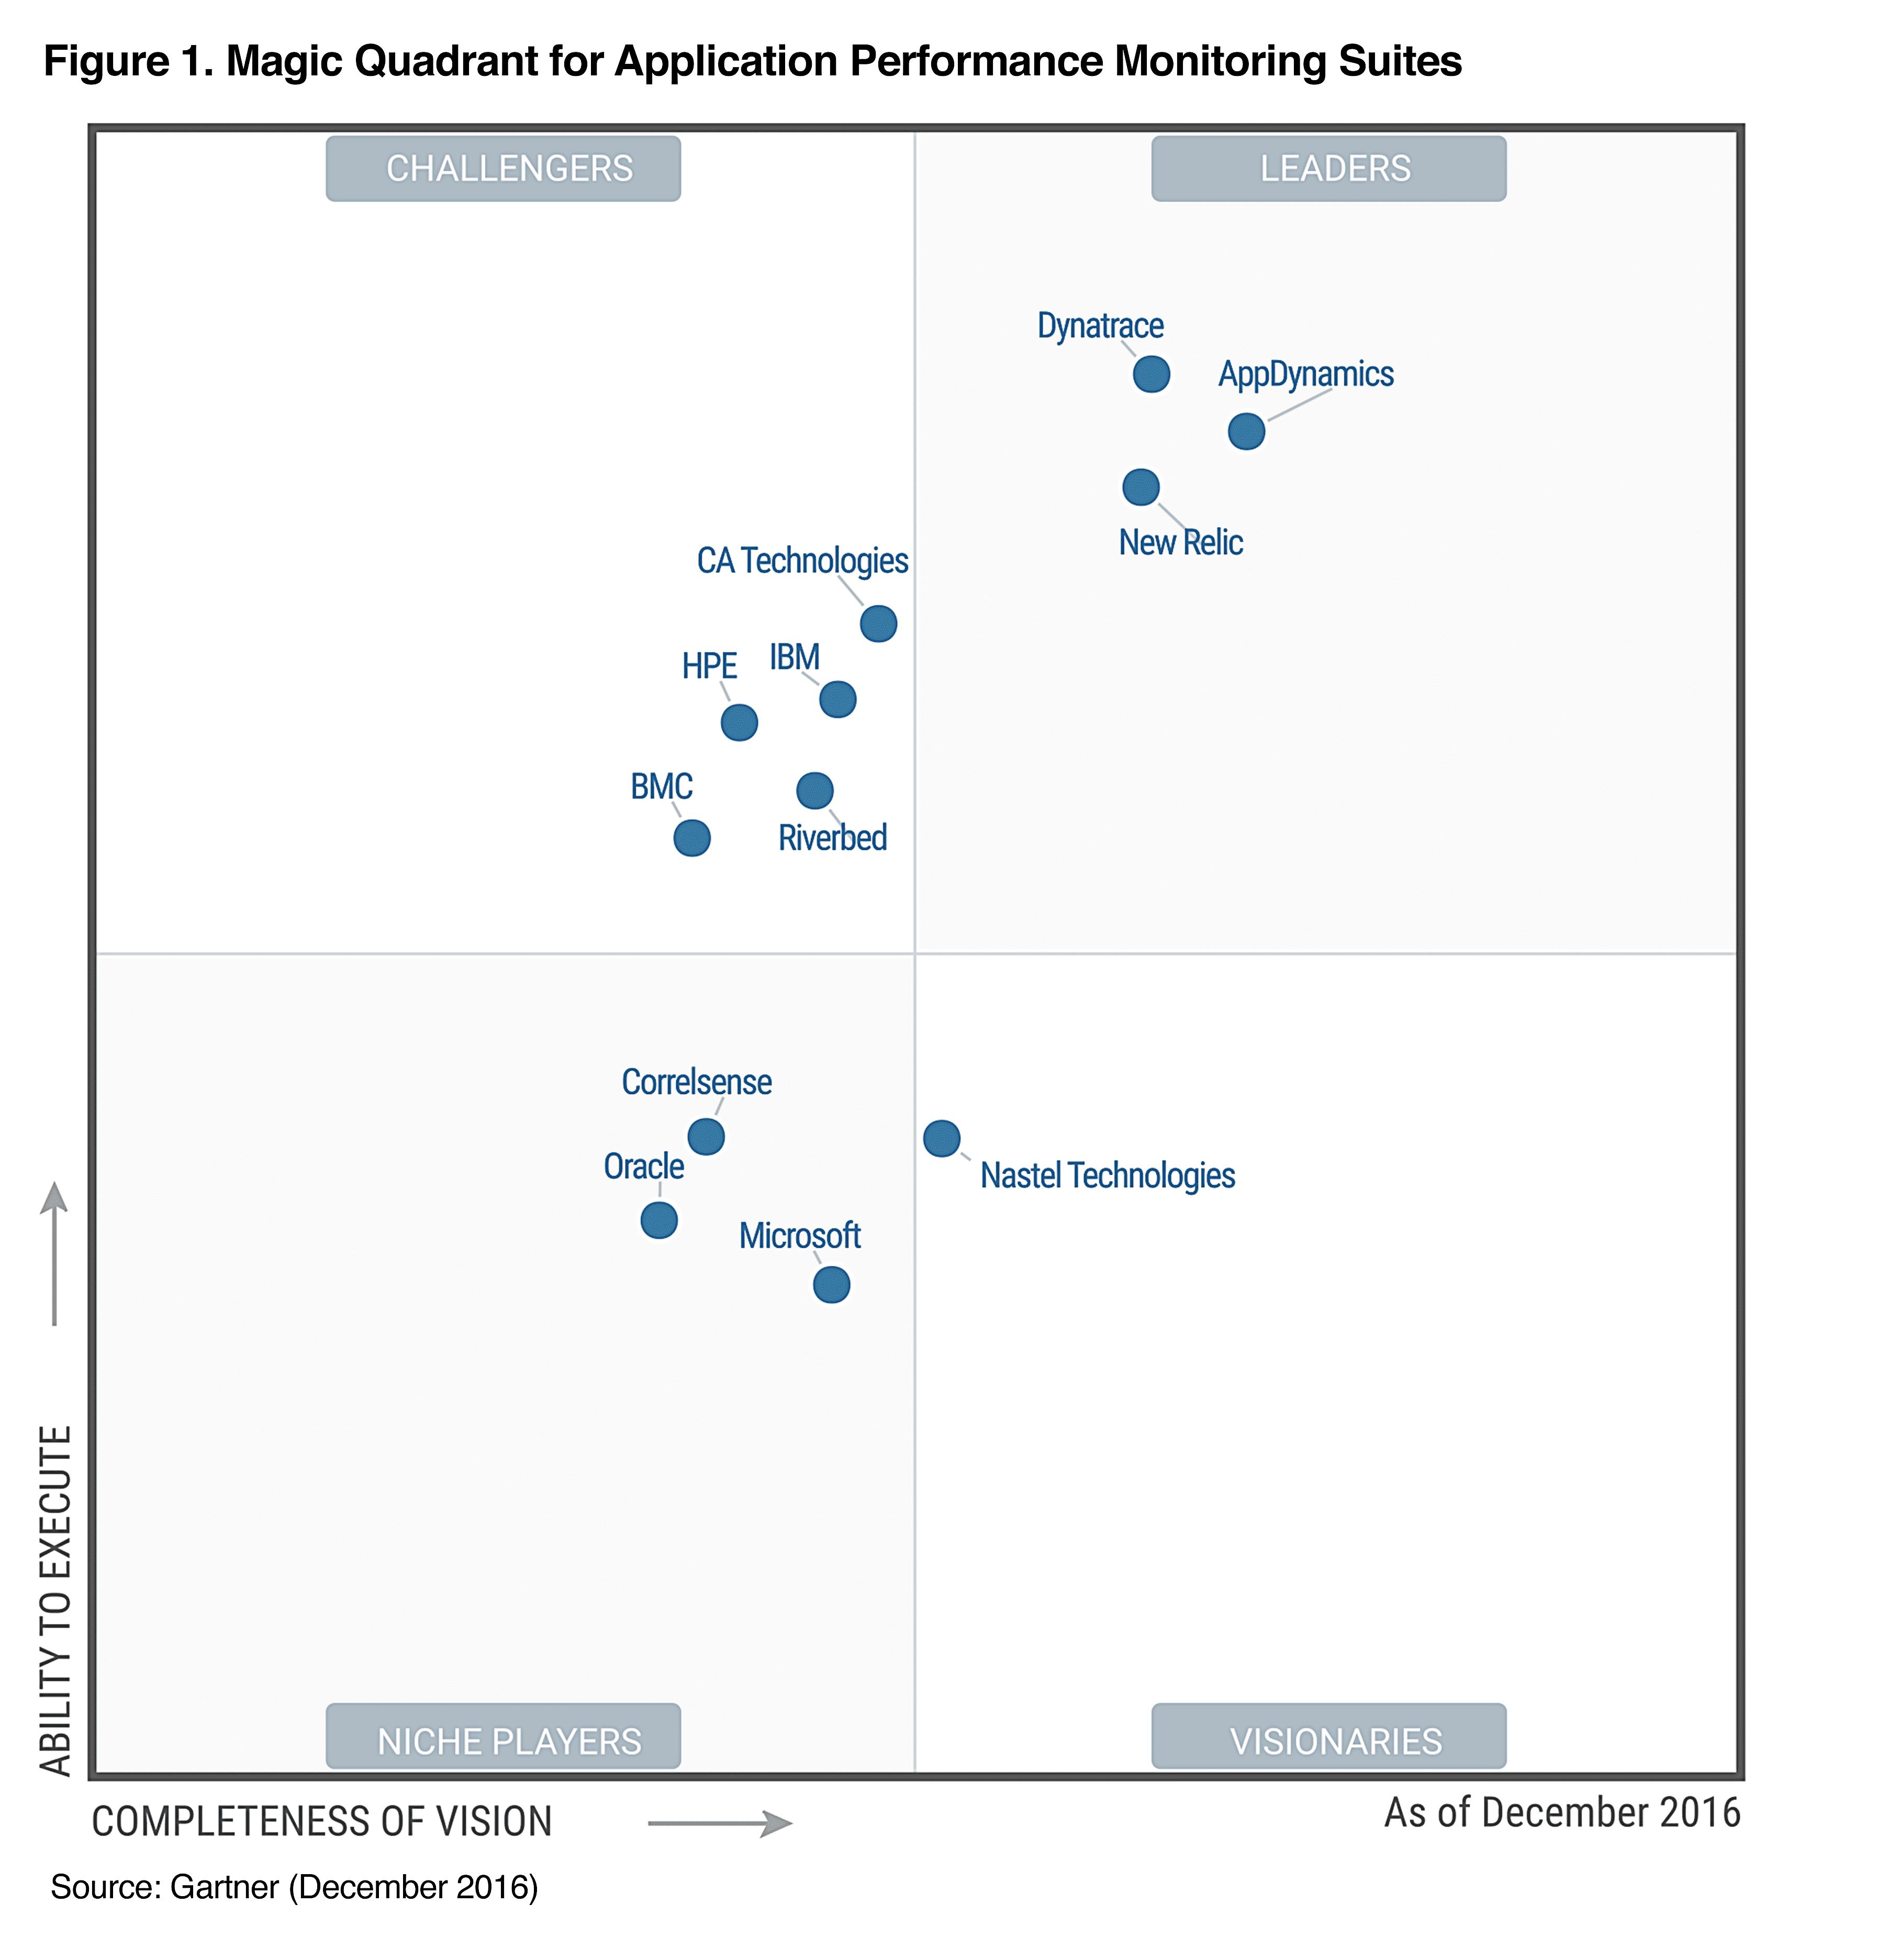 2016 Gartner Magic Quadrant for Application Performance Monitoring Suites